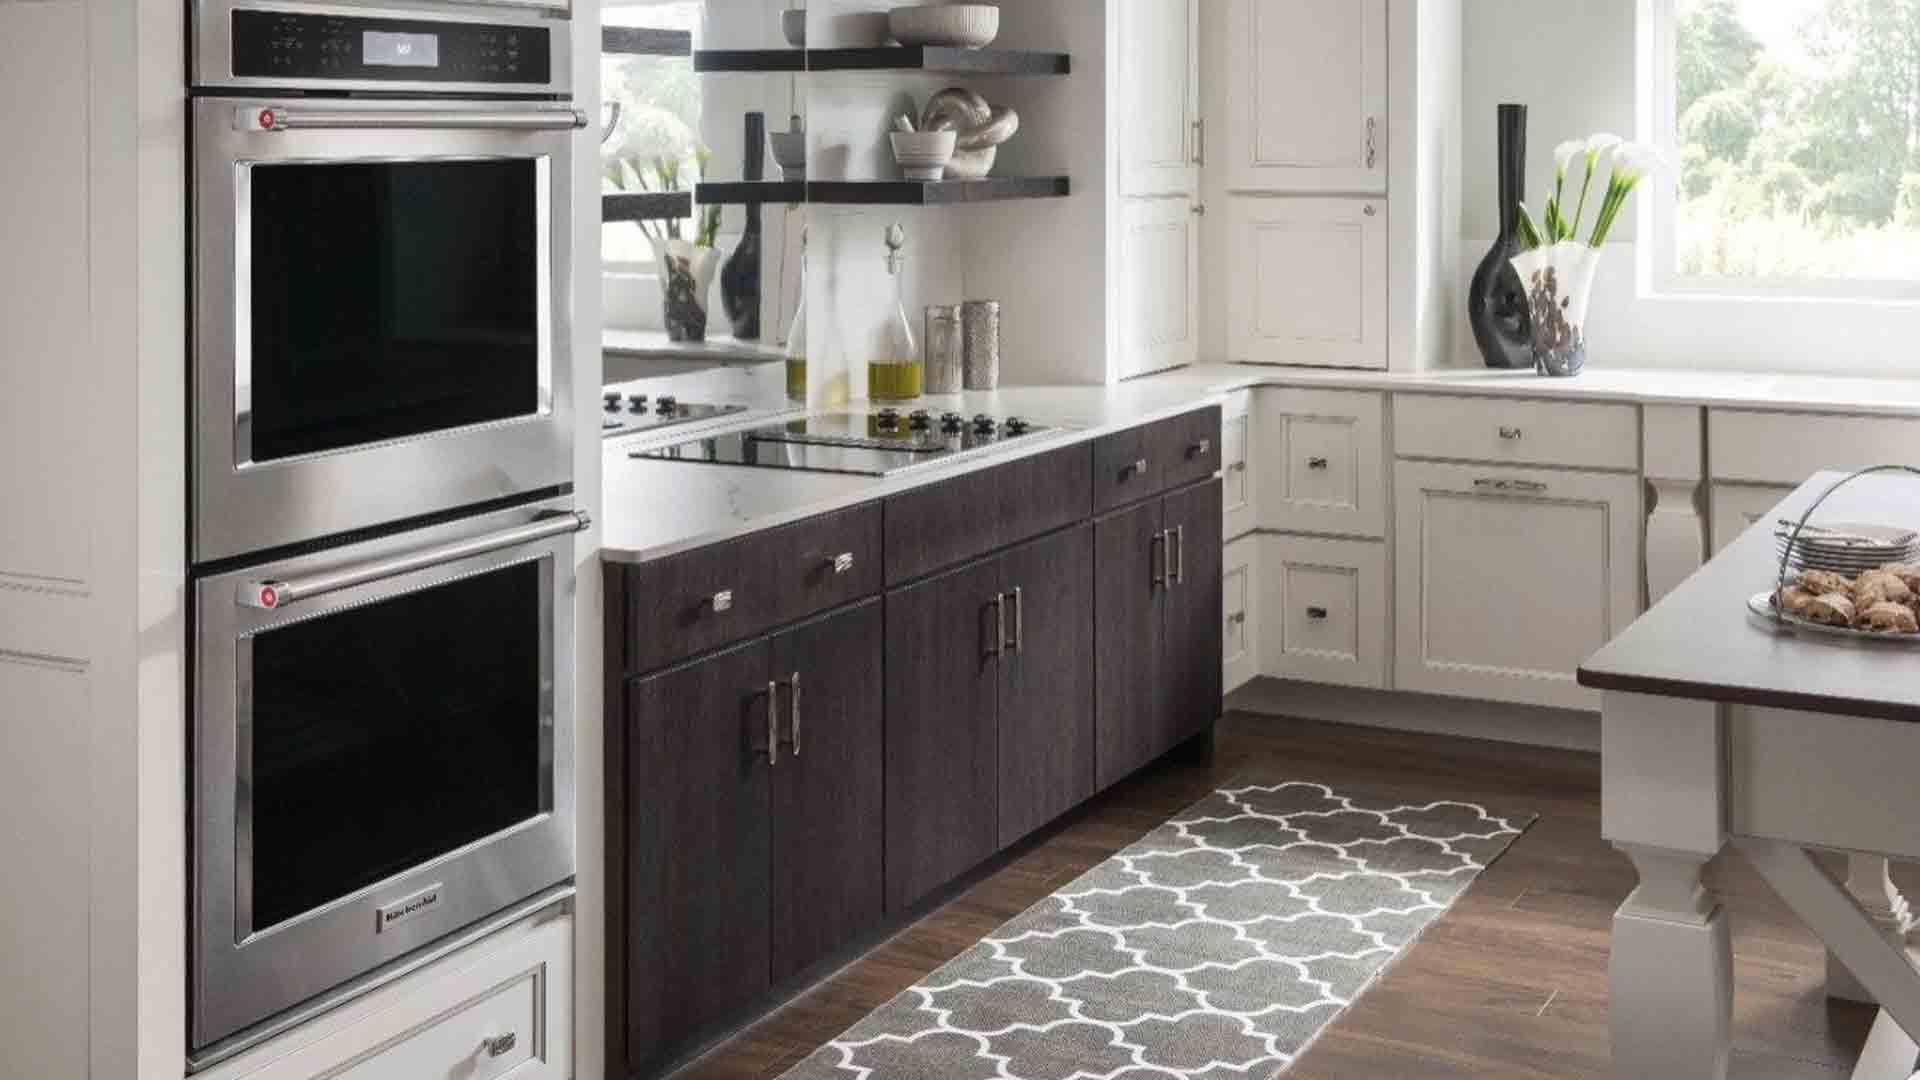 Kitchenaid Double Wall Oven Repair Service | Kitchenaid Repairs